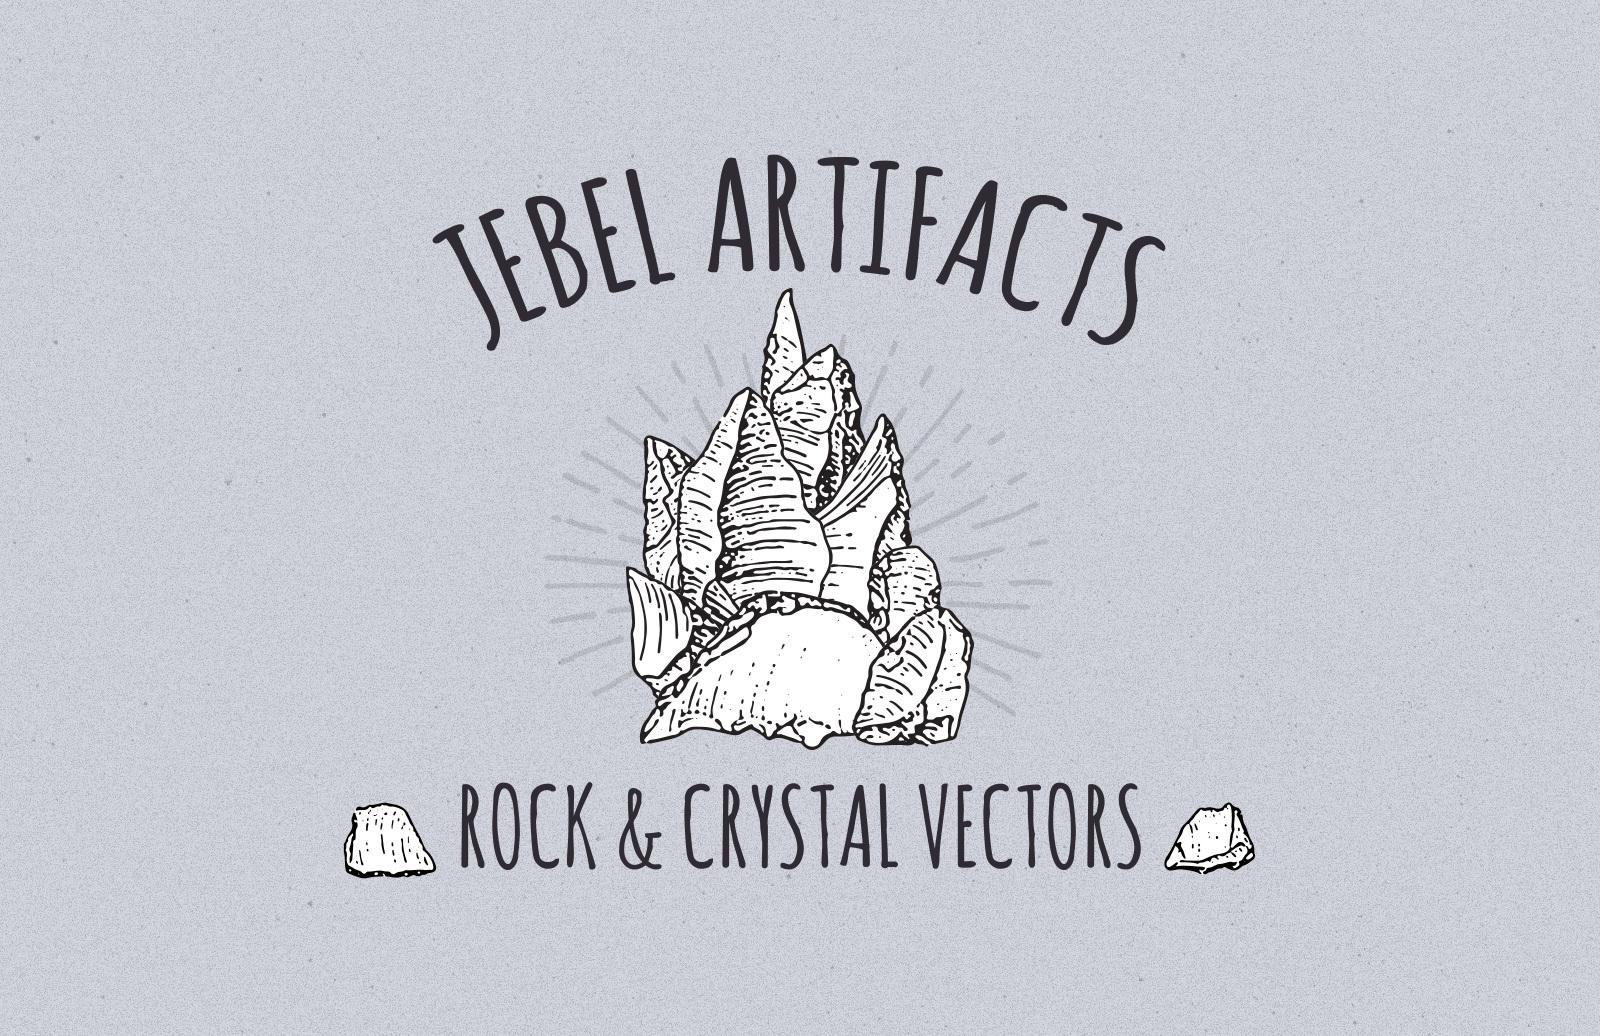 Jebel Artifacts: Rock & Crystal Vectors